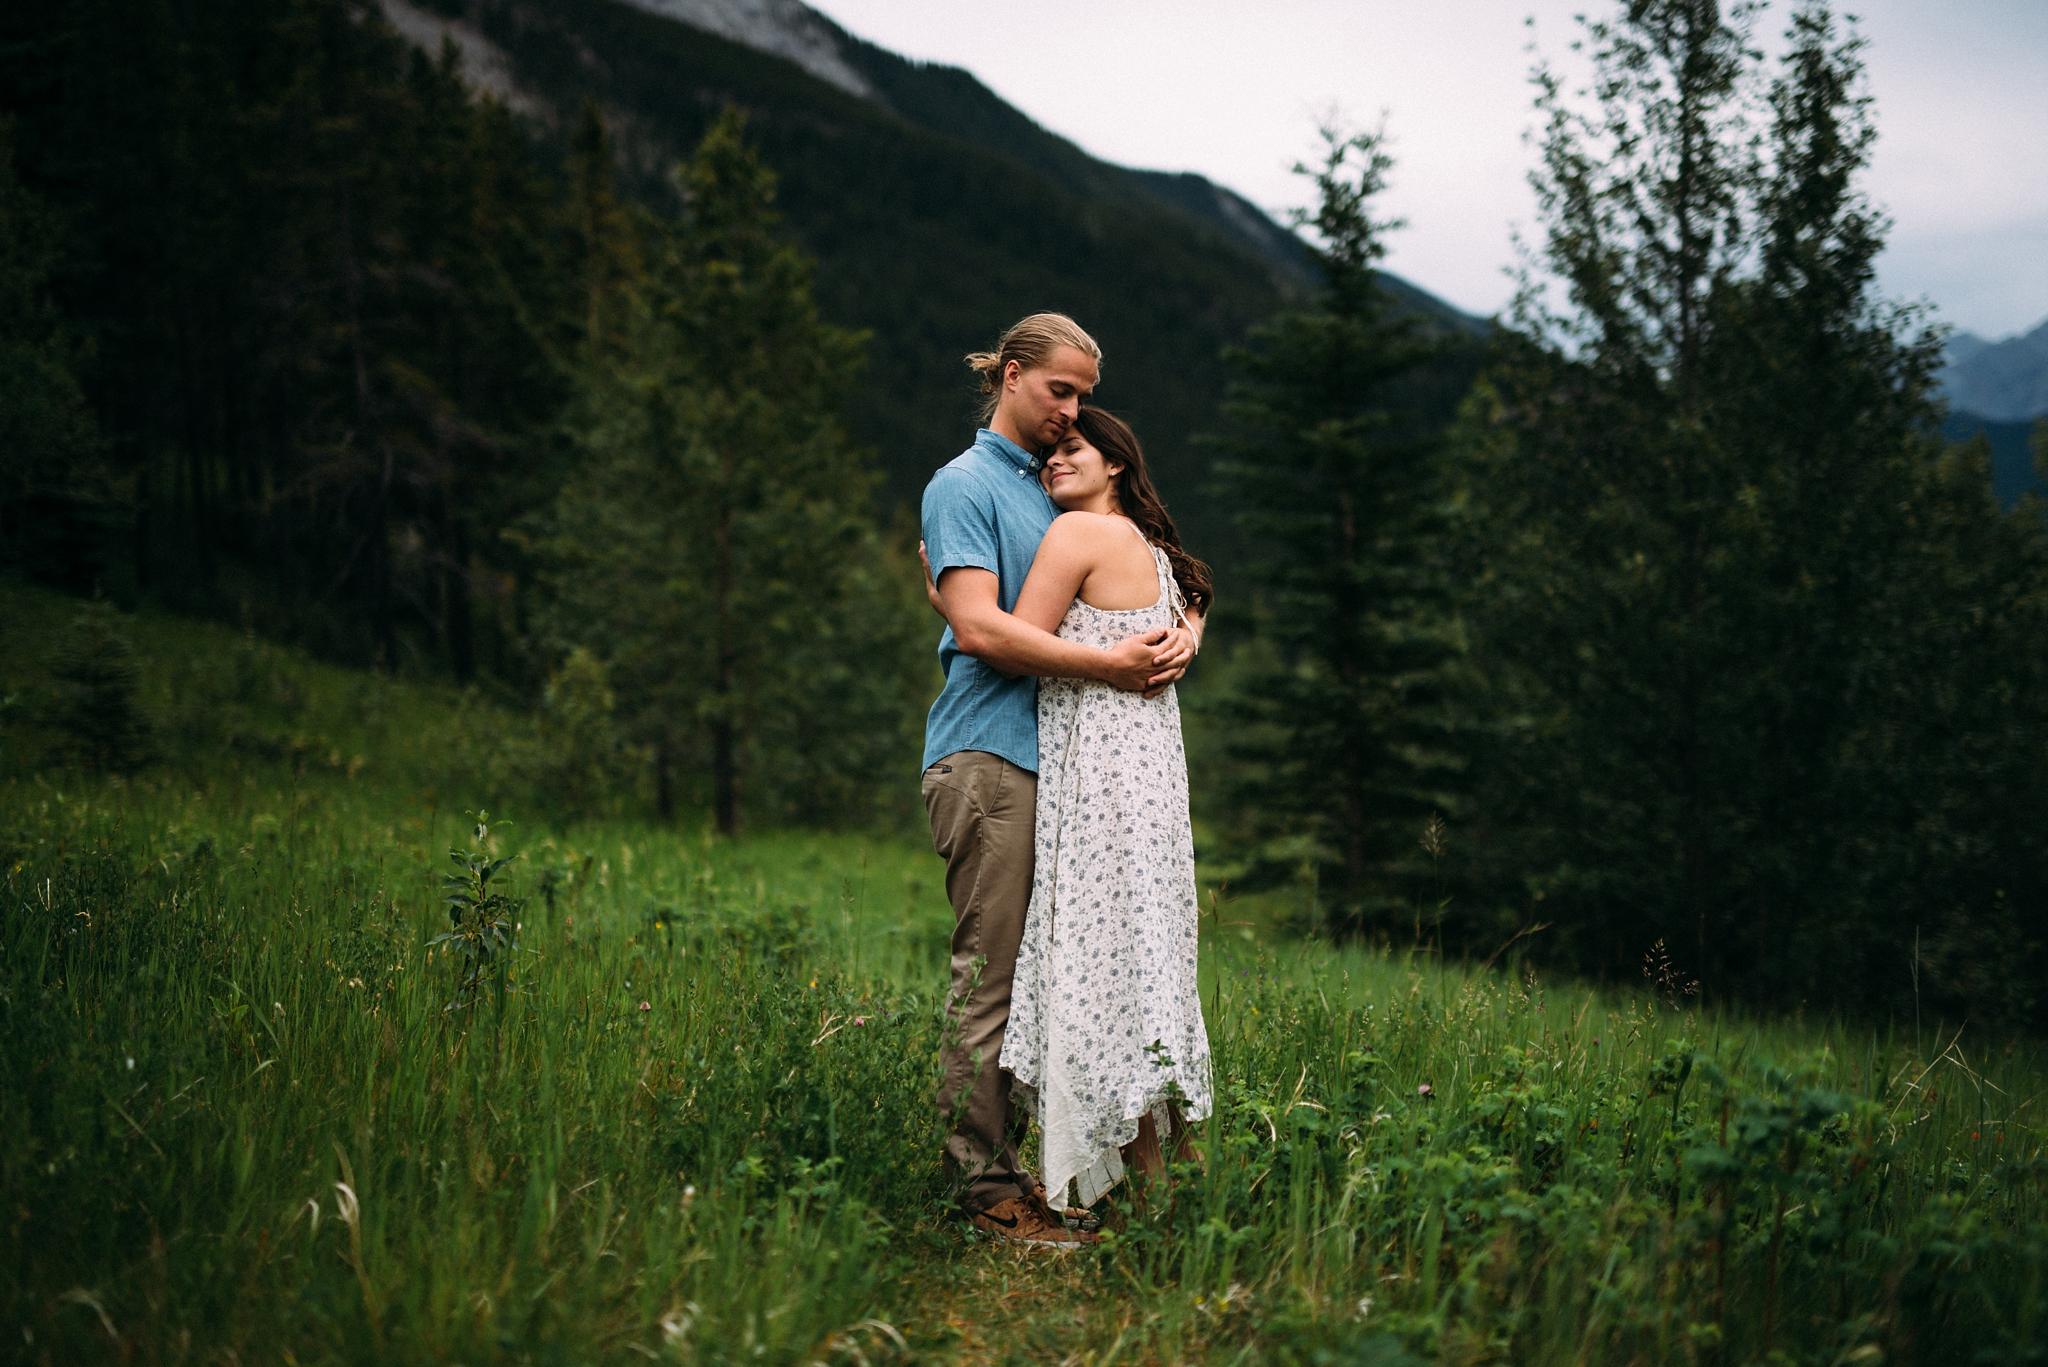 kaihla_tonai_intimate_wedding_elopement_photographer_4193